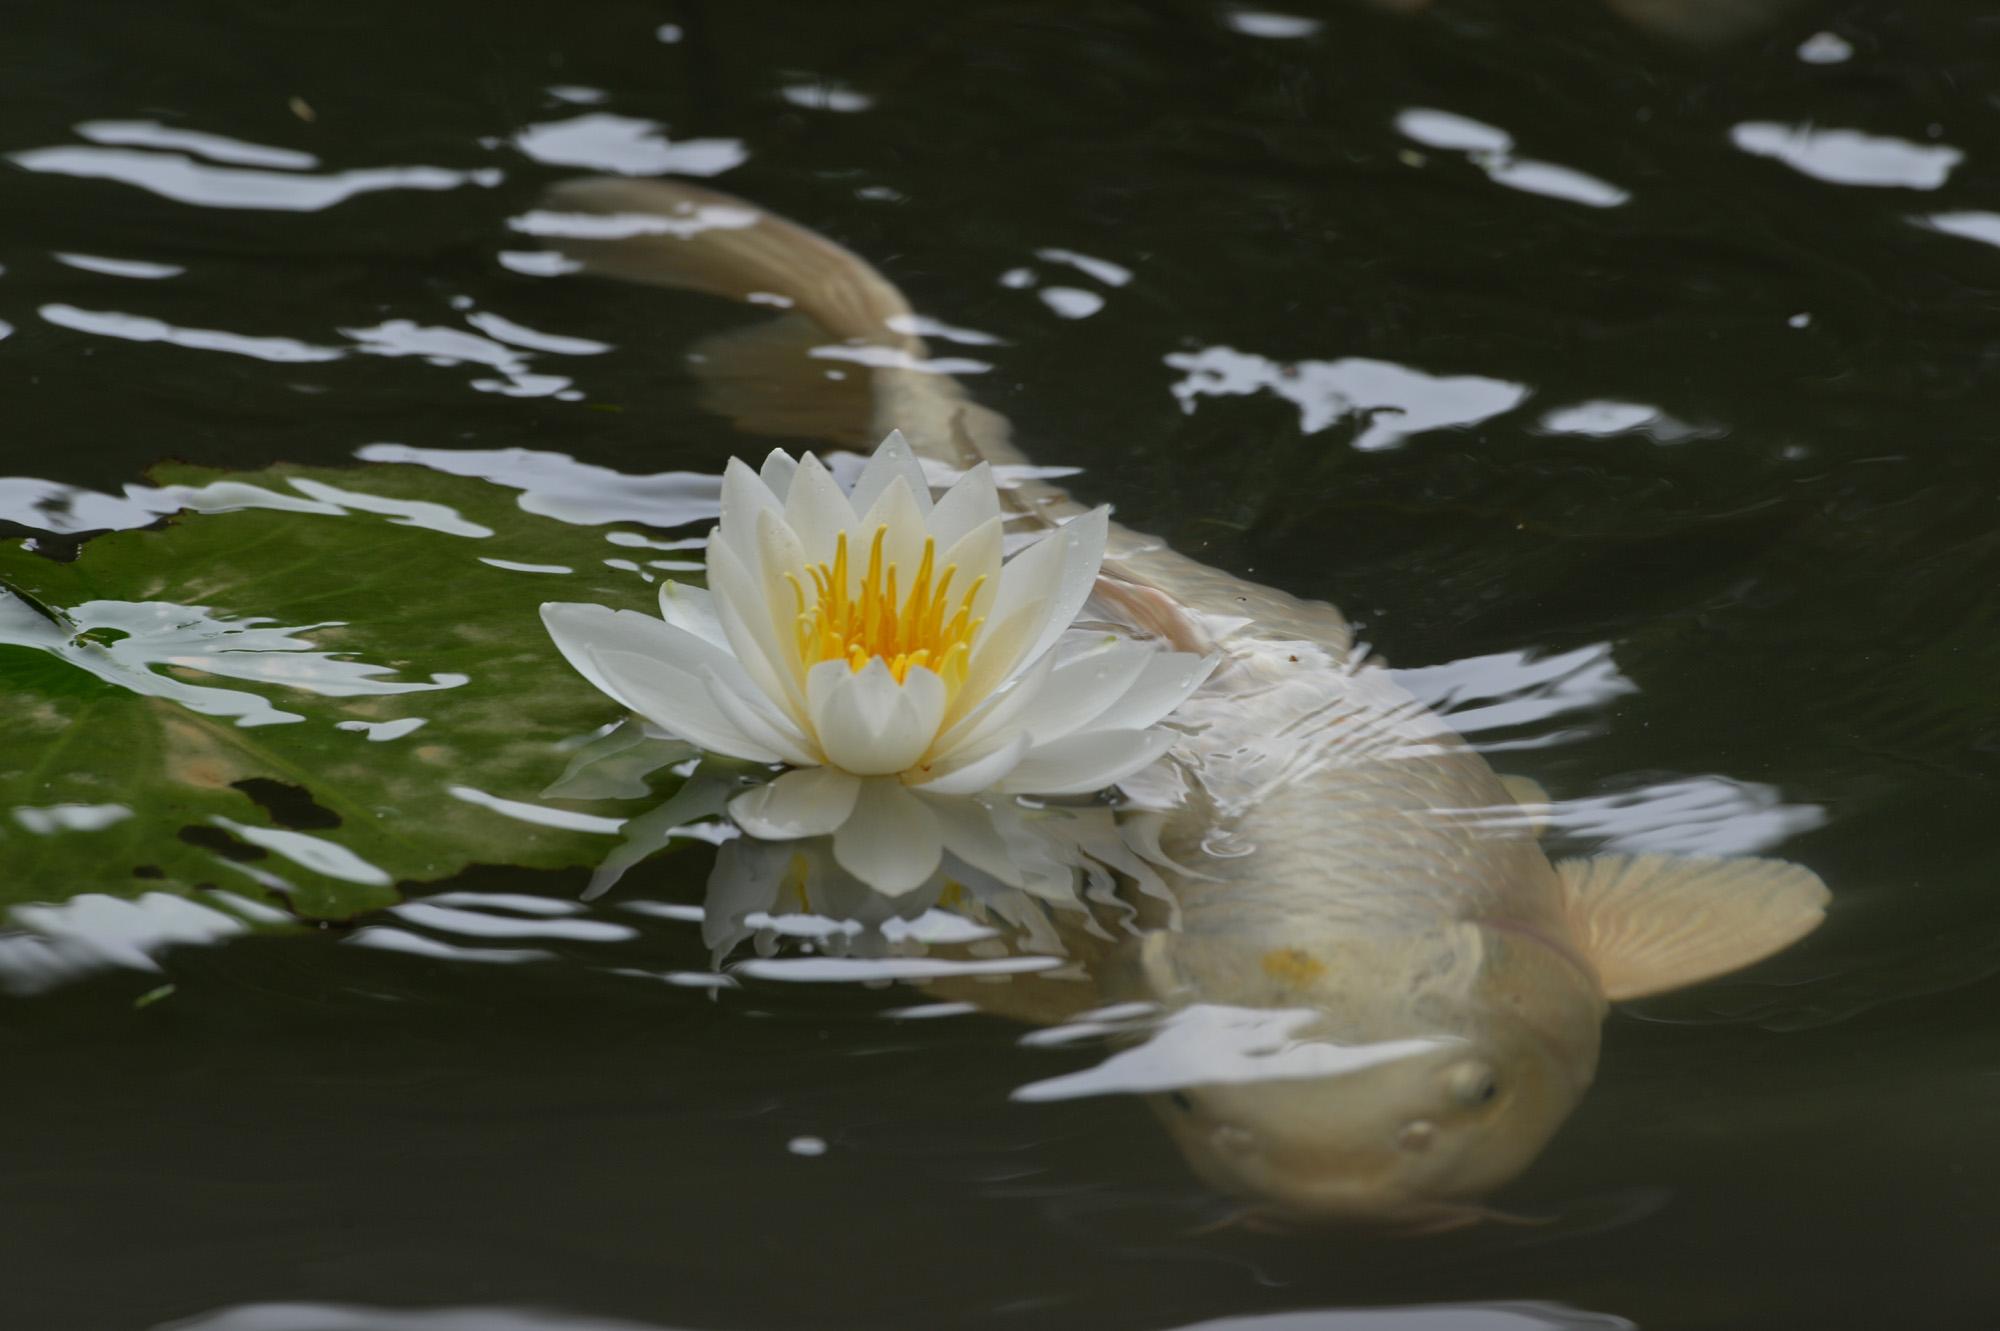 Nikon Dfで睡蓮を撮る。